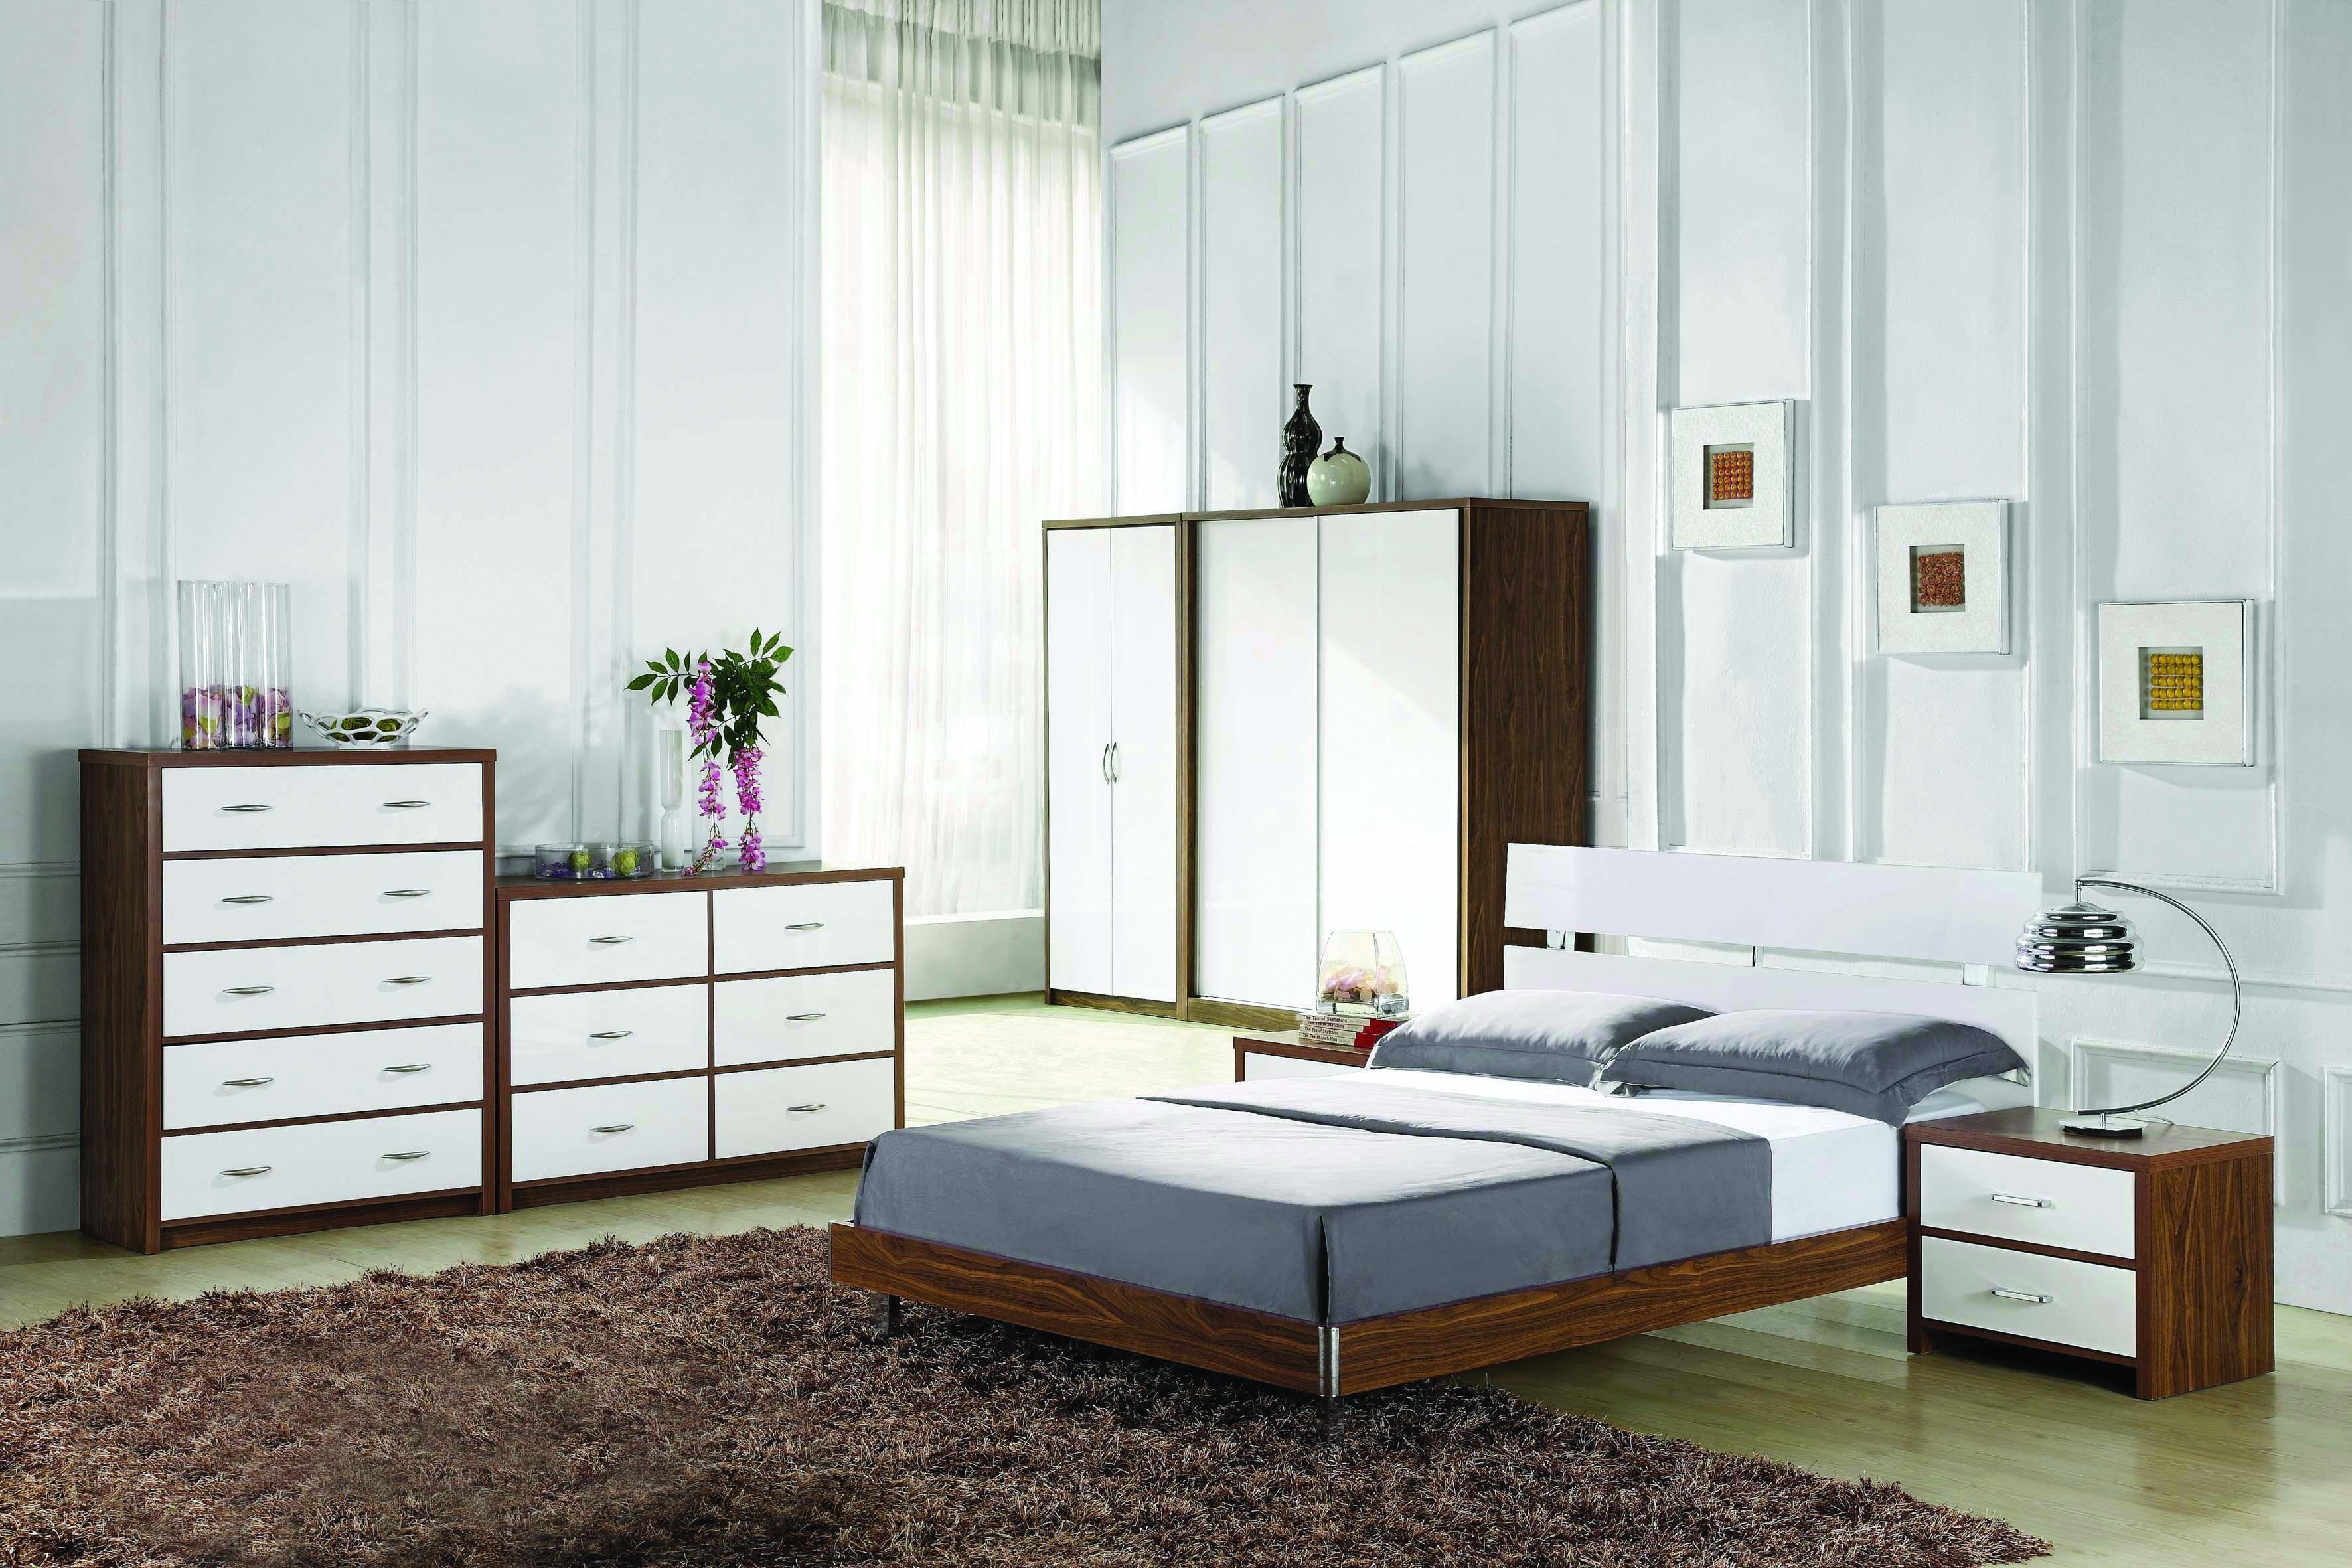 Milan Bedroom Furniture Milanjpg